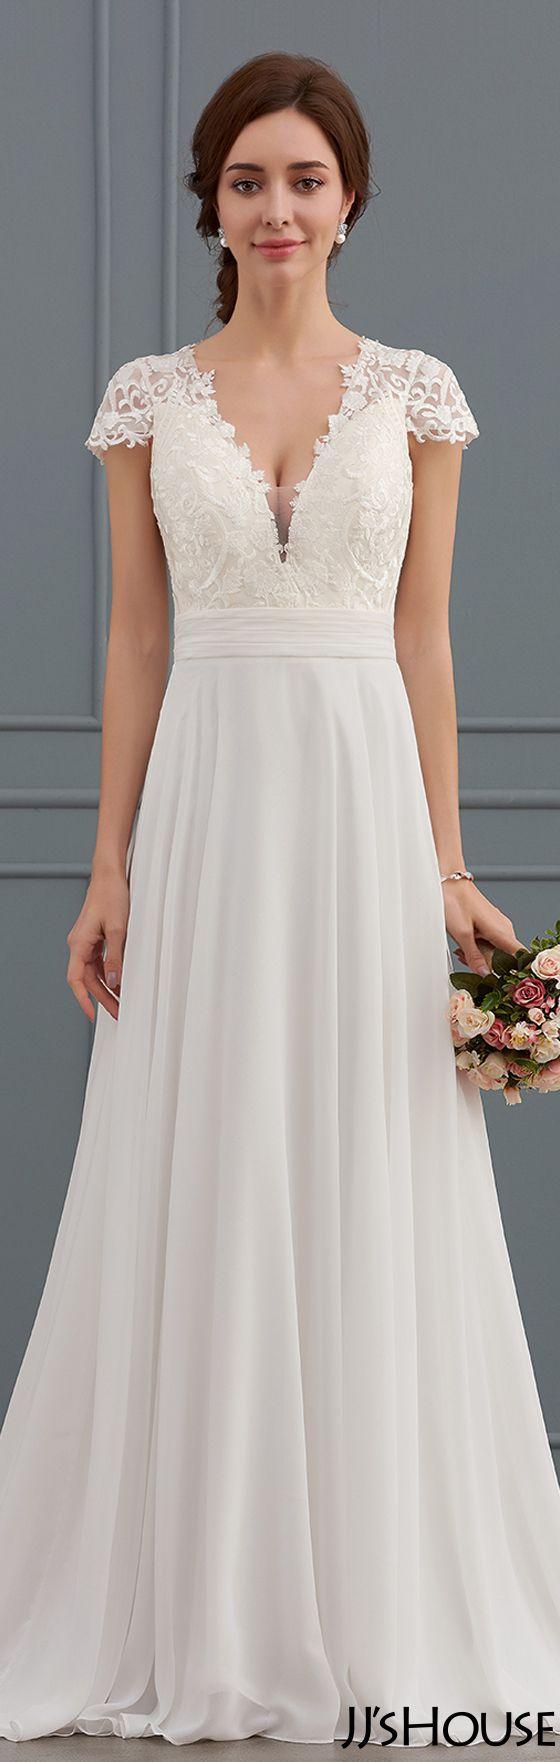 Amazing V-neck wedding dress!#JJsHouse#Wedding